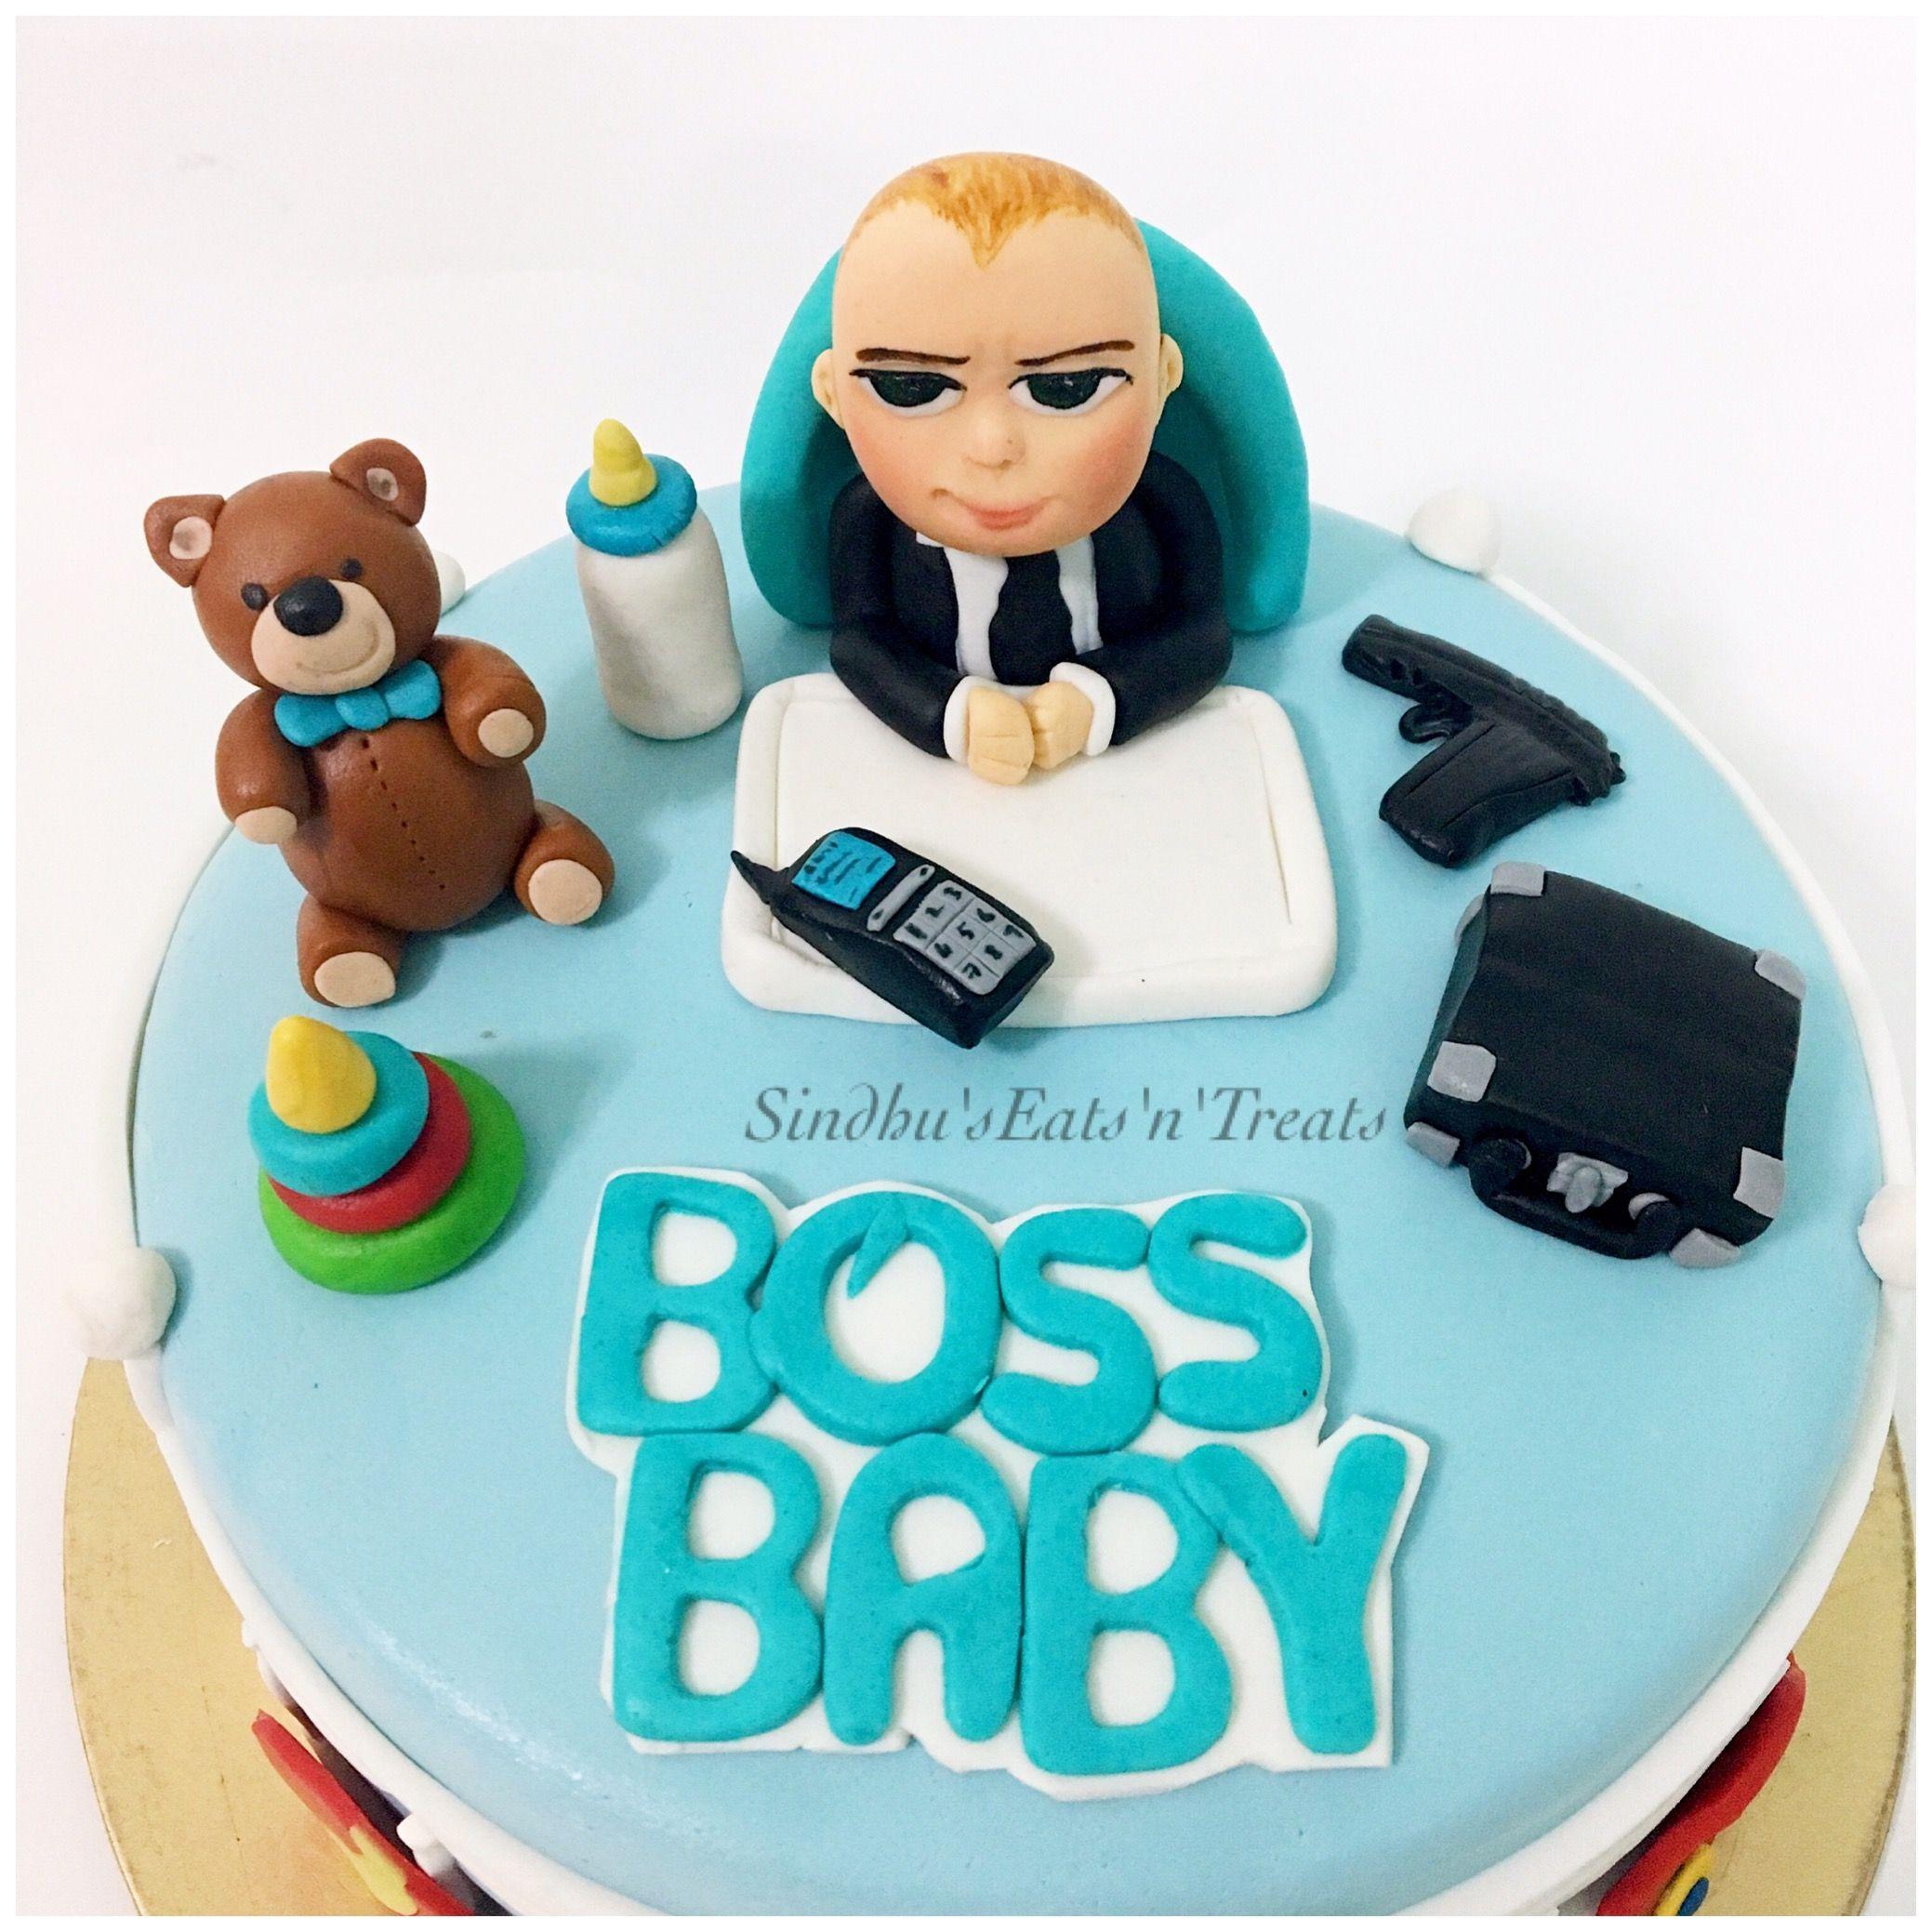 Boss baby cake   cakes for kids   Birthday Cake, Cake ...